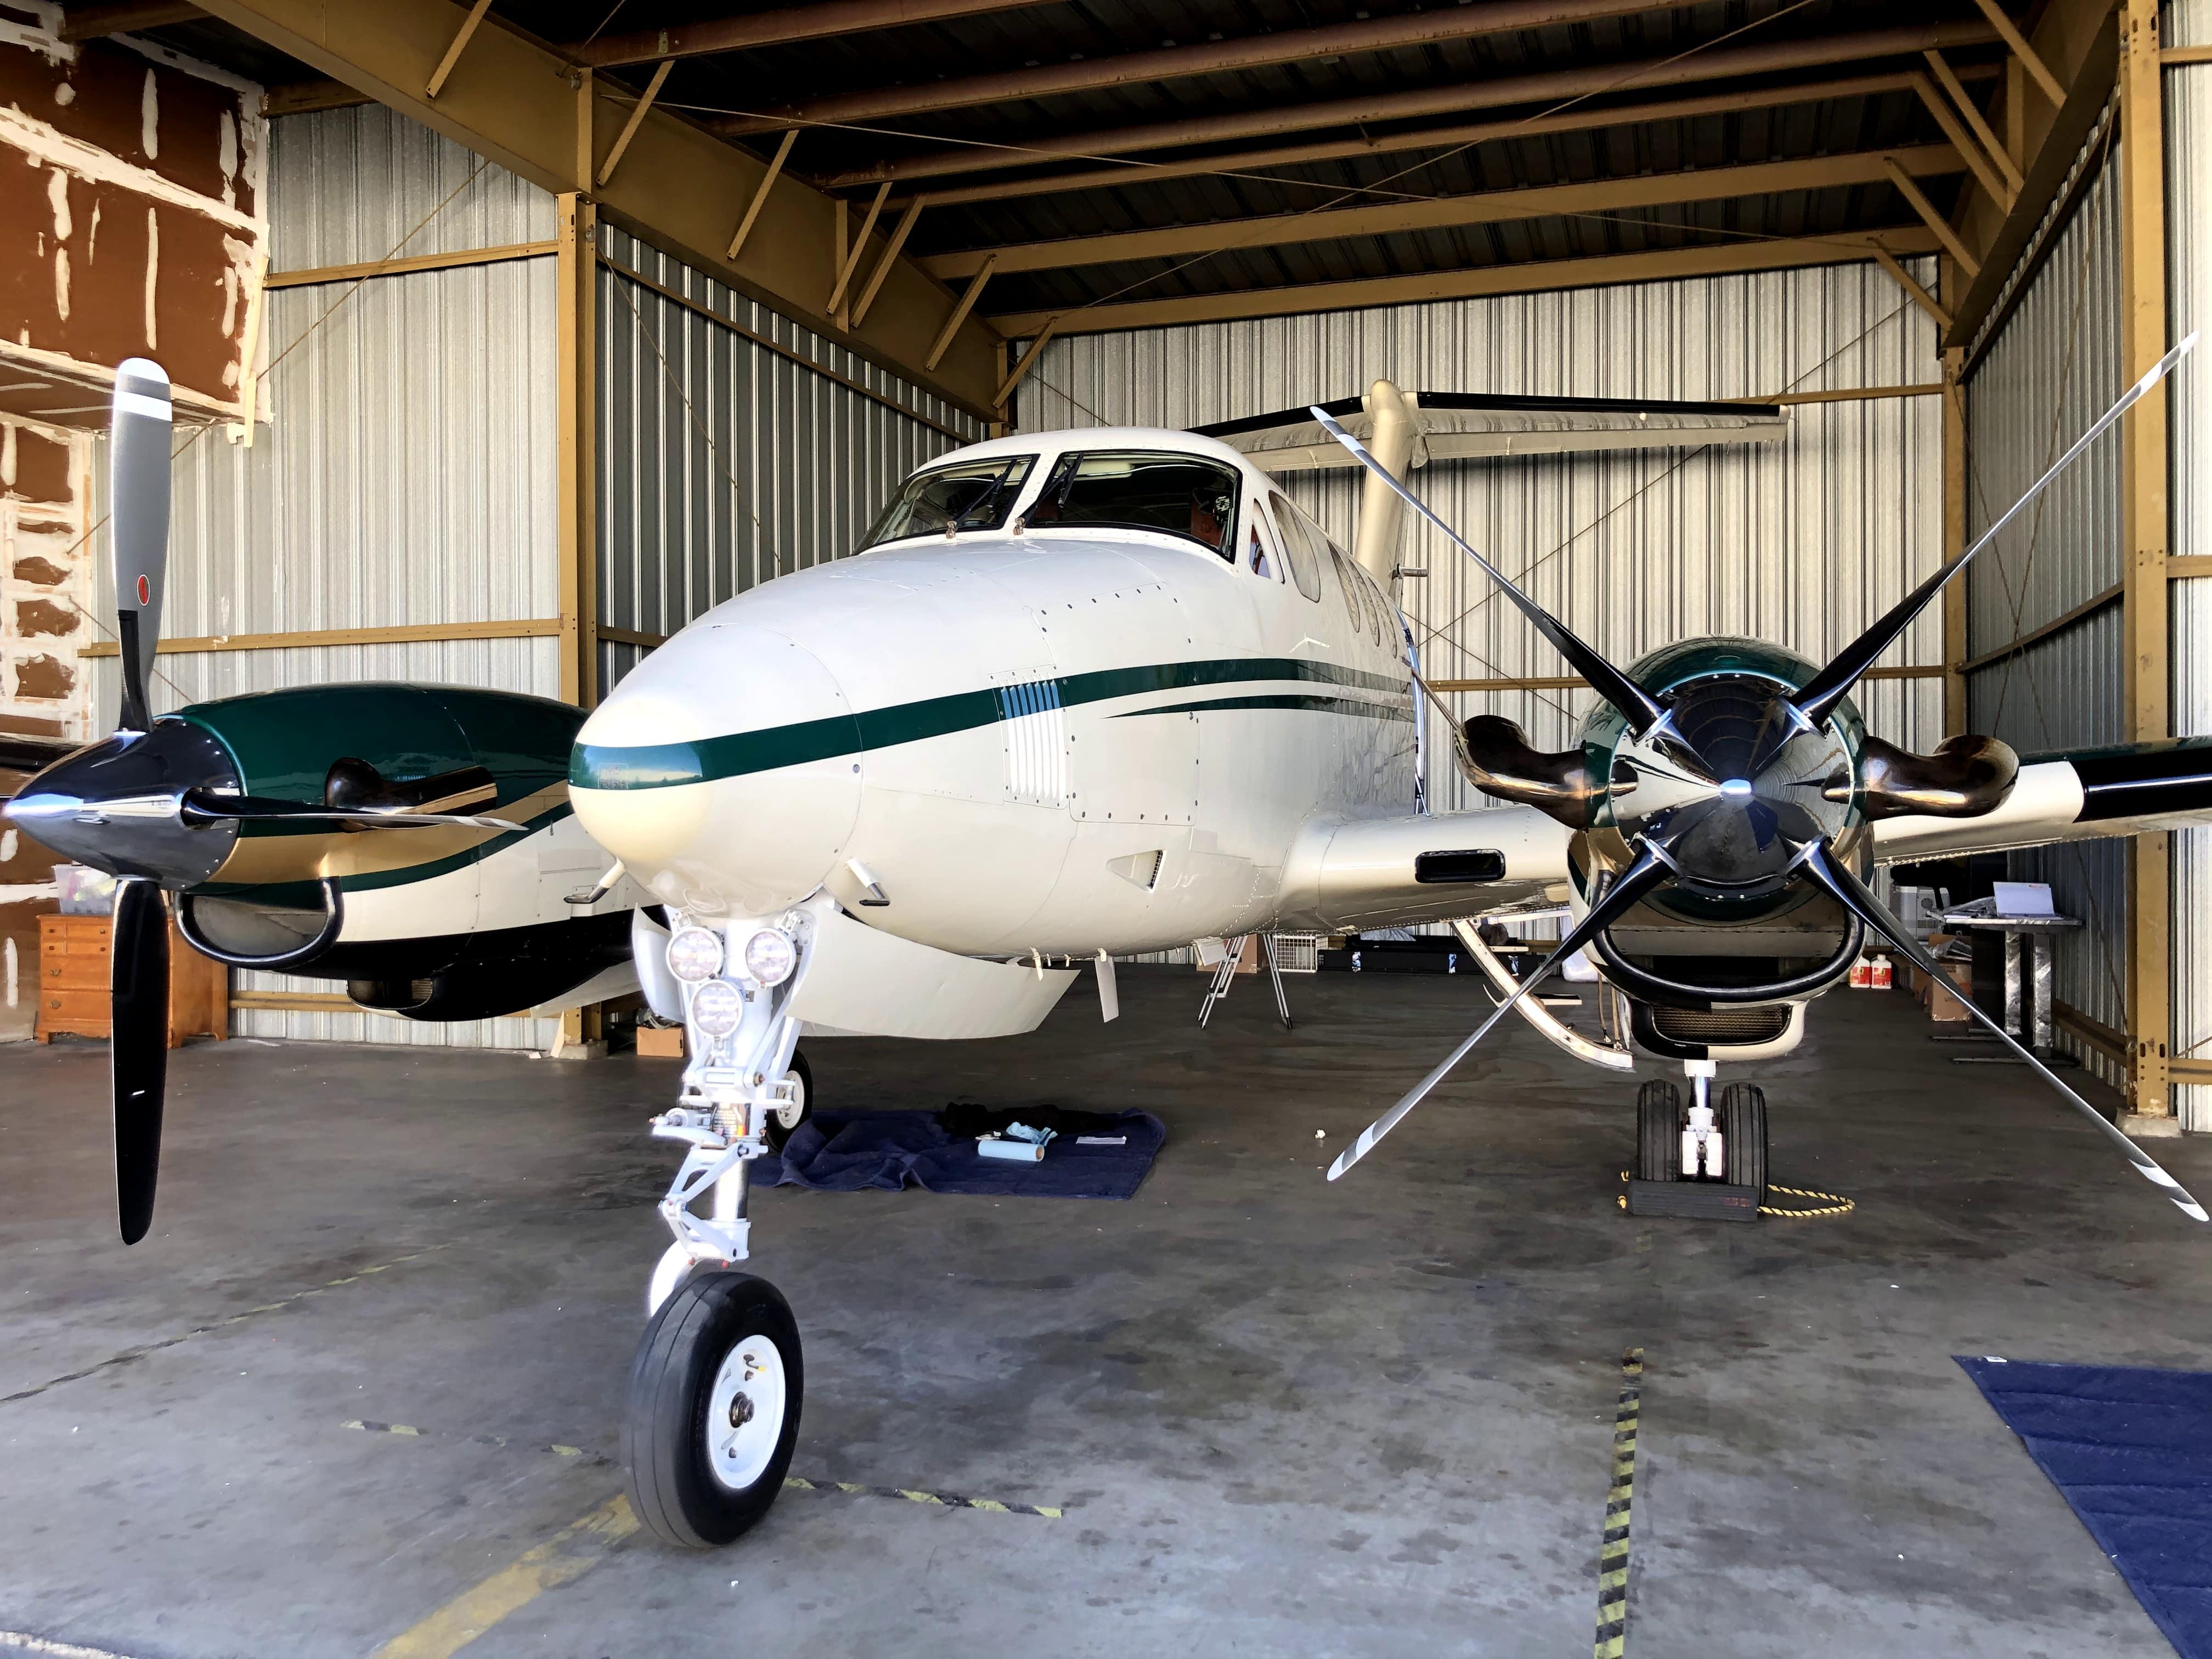 King Air F90 in Hangar